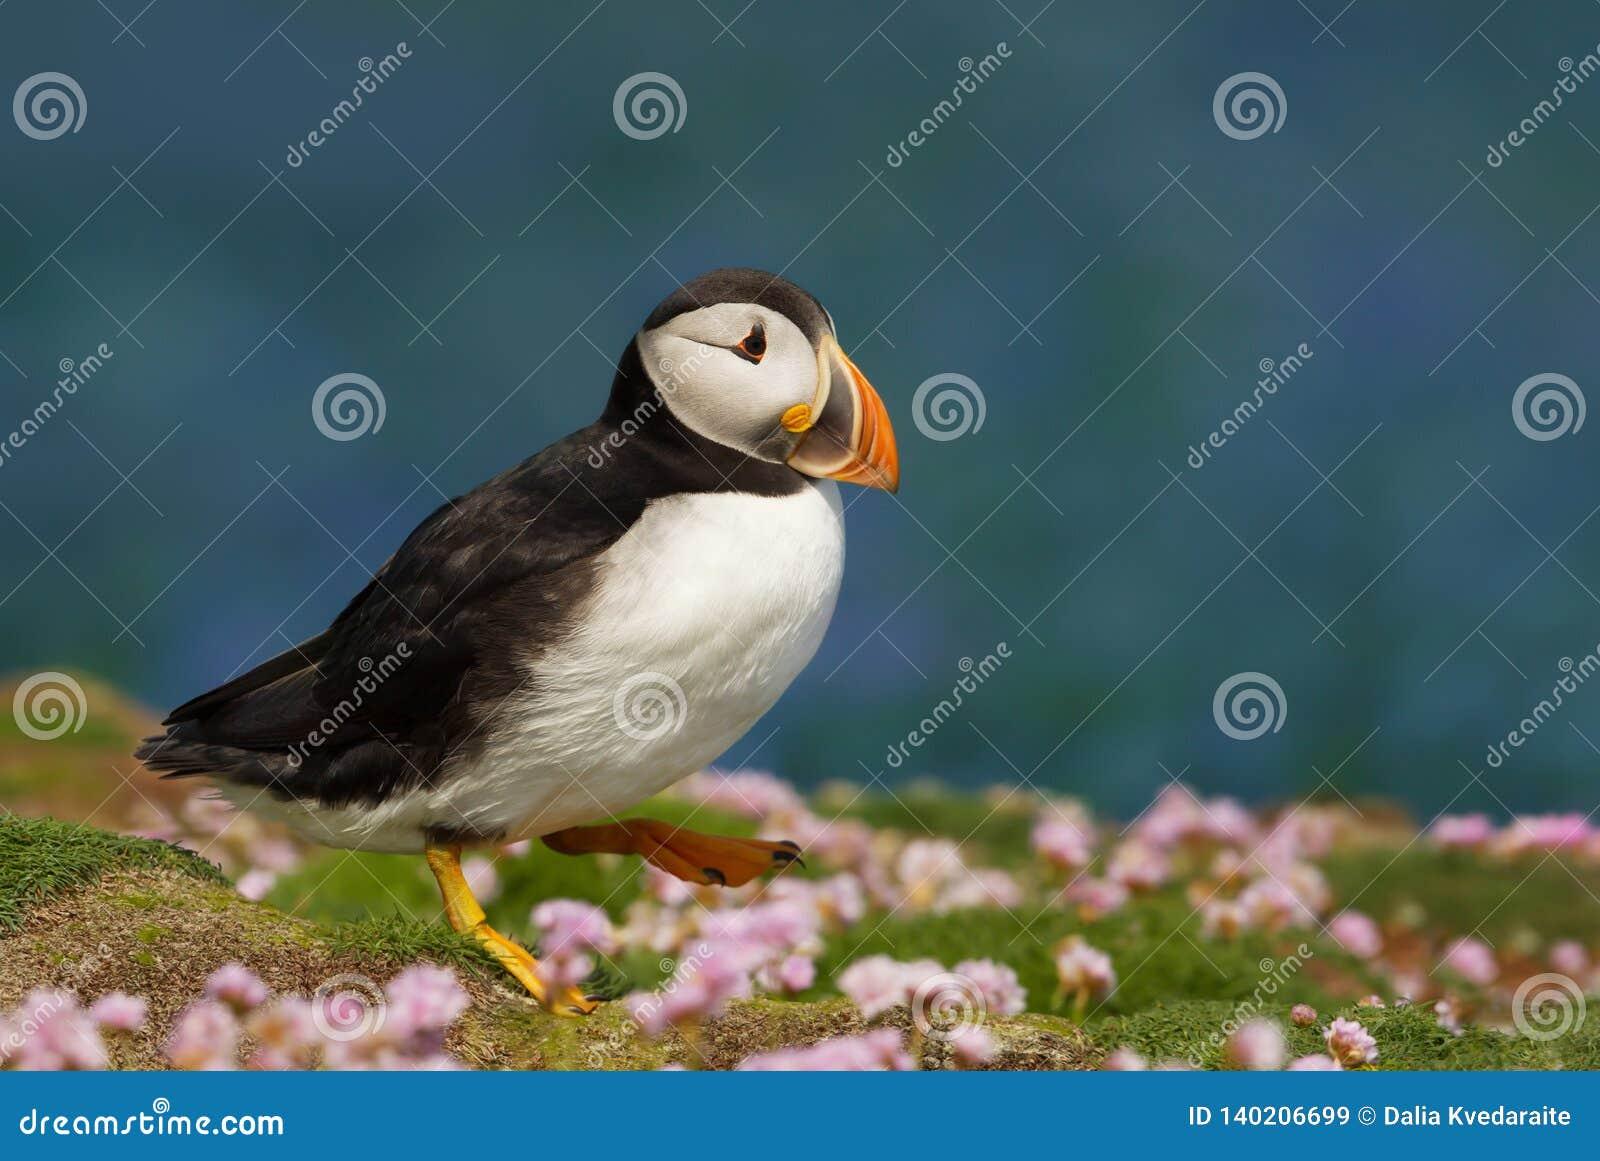 Atlantisk lunnefågel som går i sparsamhet i sommar